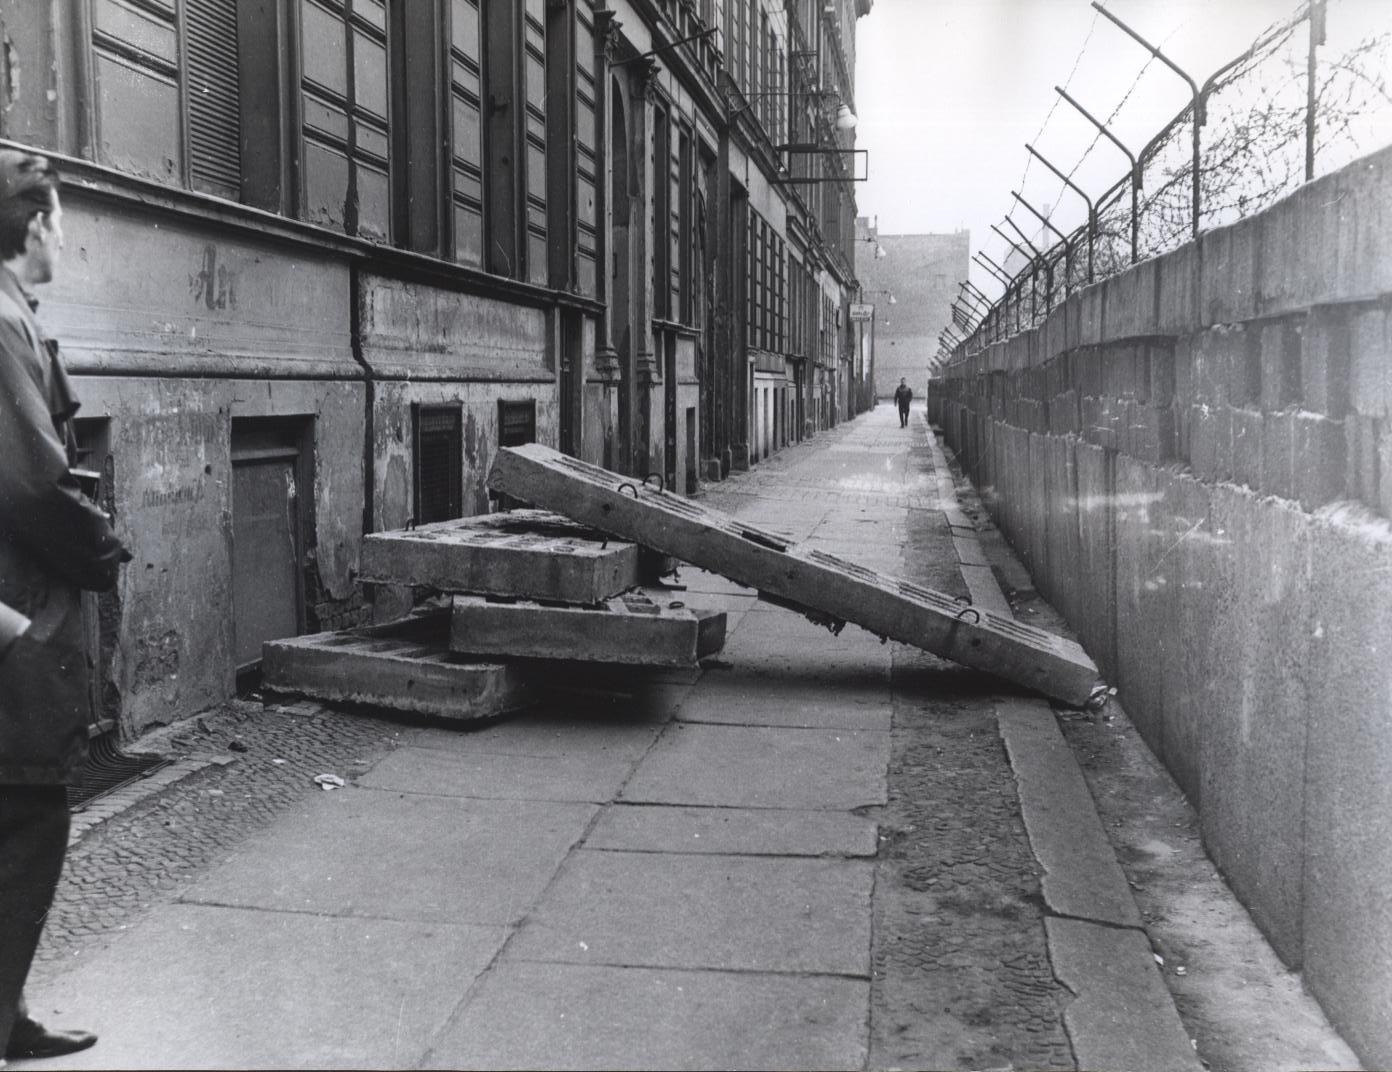 306-bn-95-16_berlin-kreuzberg-heinrich-heinestrasse-corner-to-sebastianstrasse-new-harassments-for-residents-of-west-berlin-apartments-are-closed-off-by-cement-blocks-04-25-1963